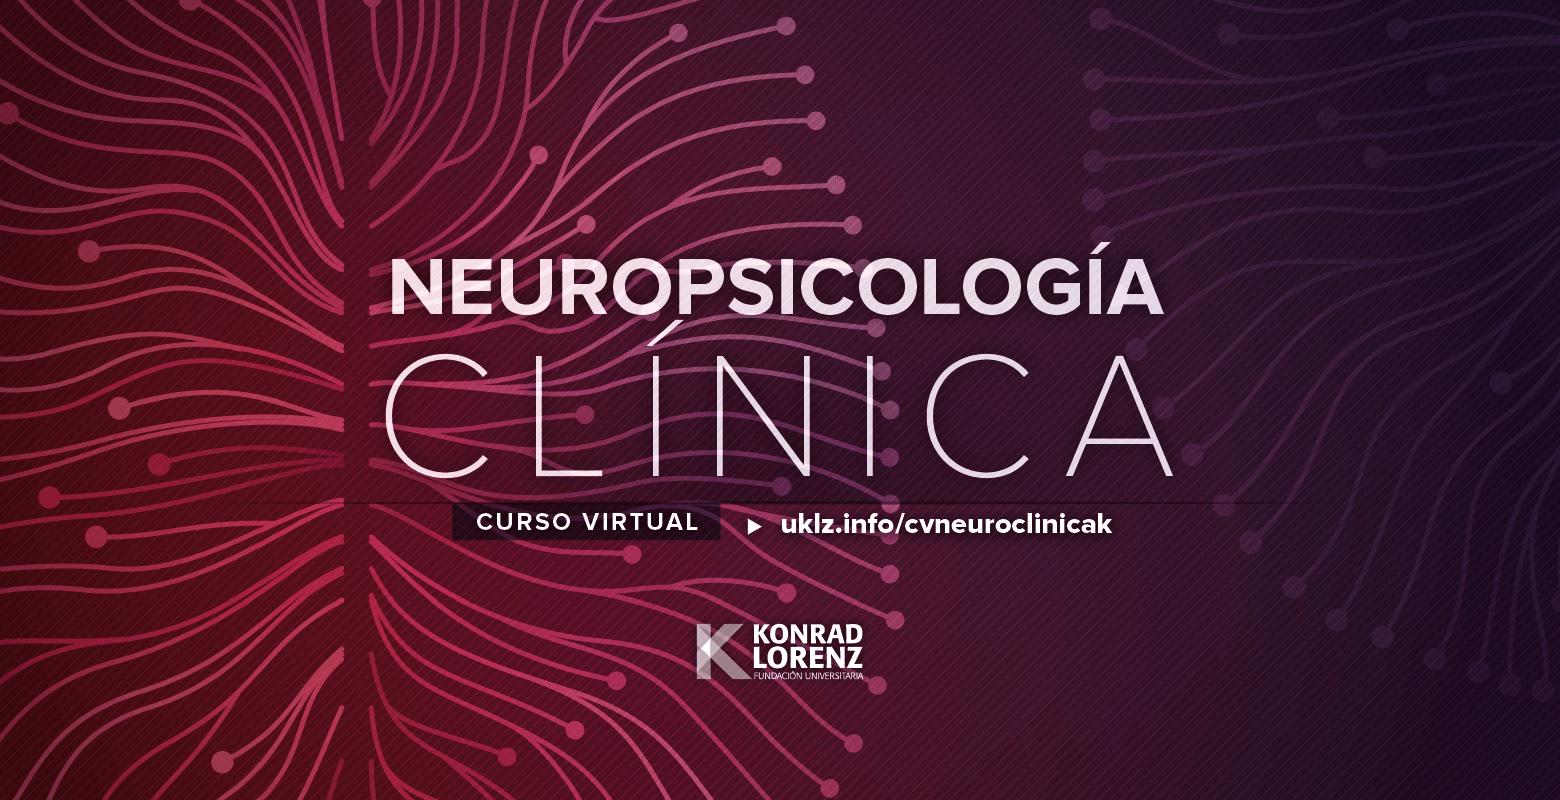 Curso Virtual Neuropsicología Clínica